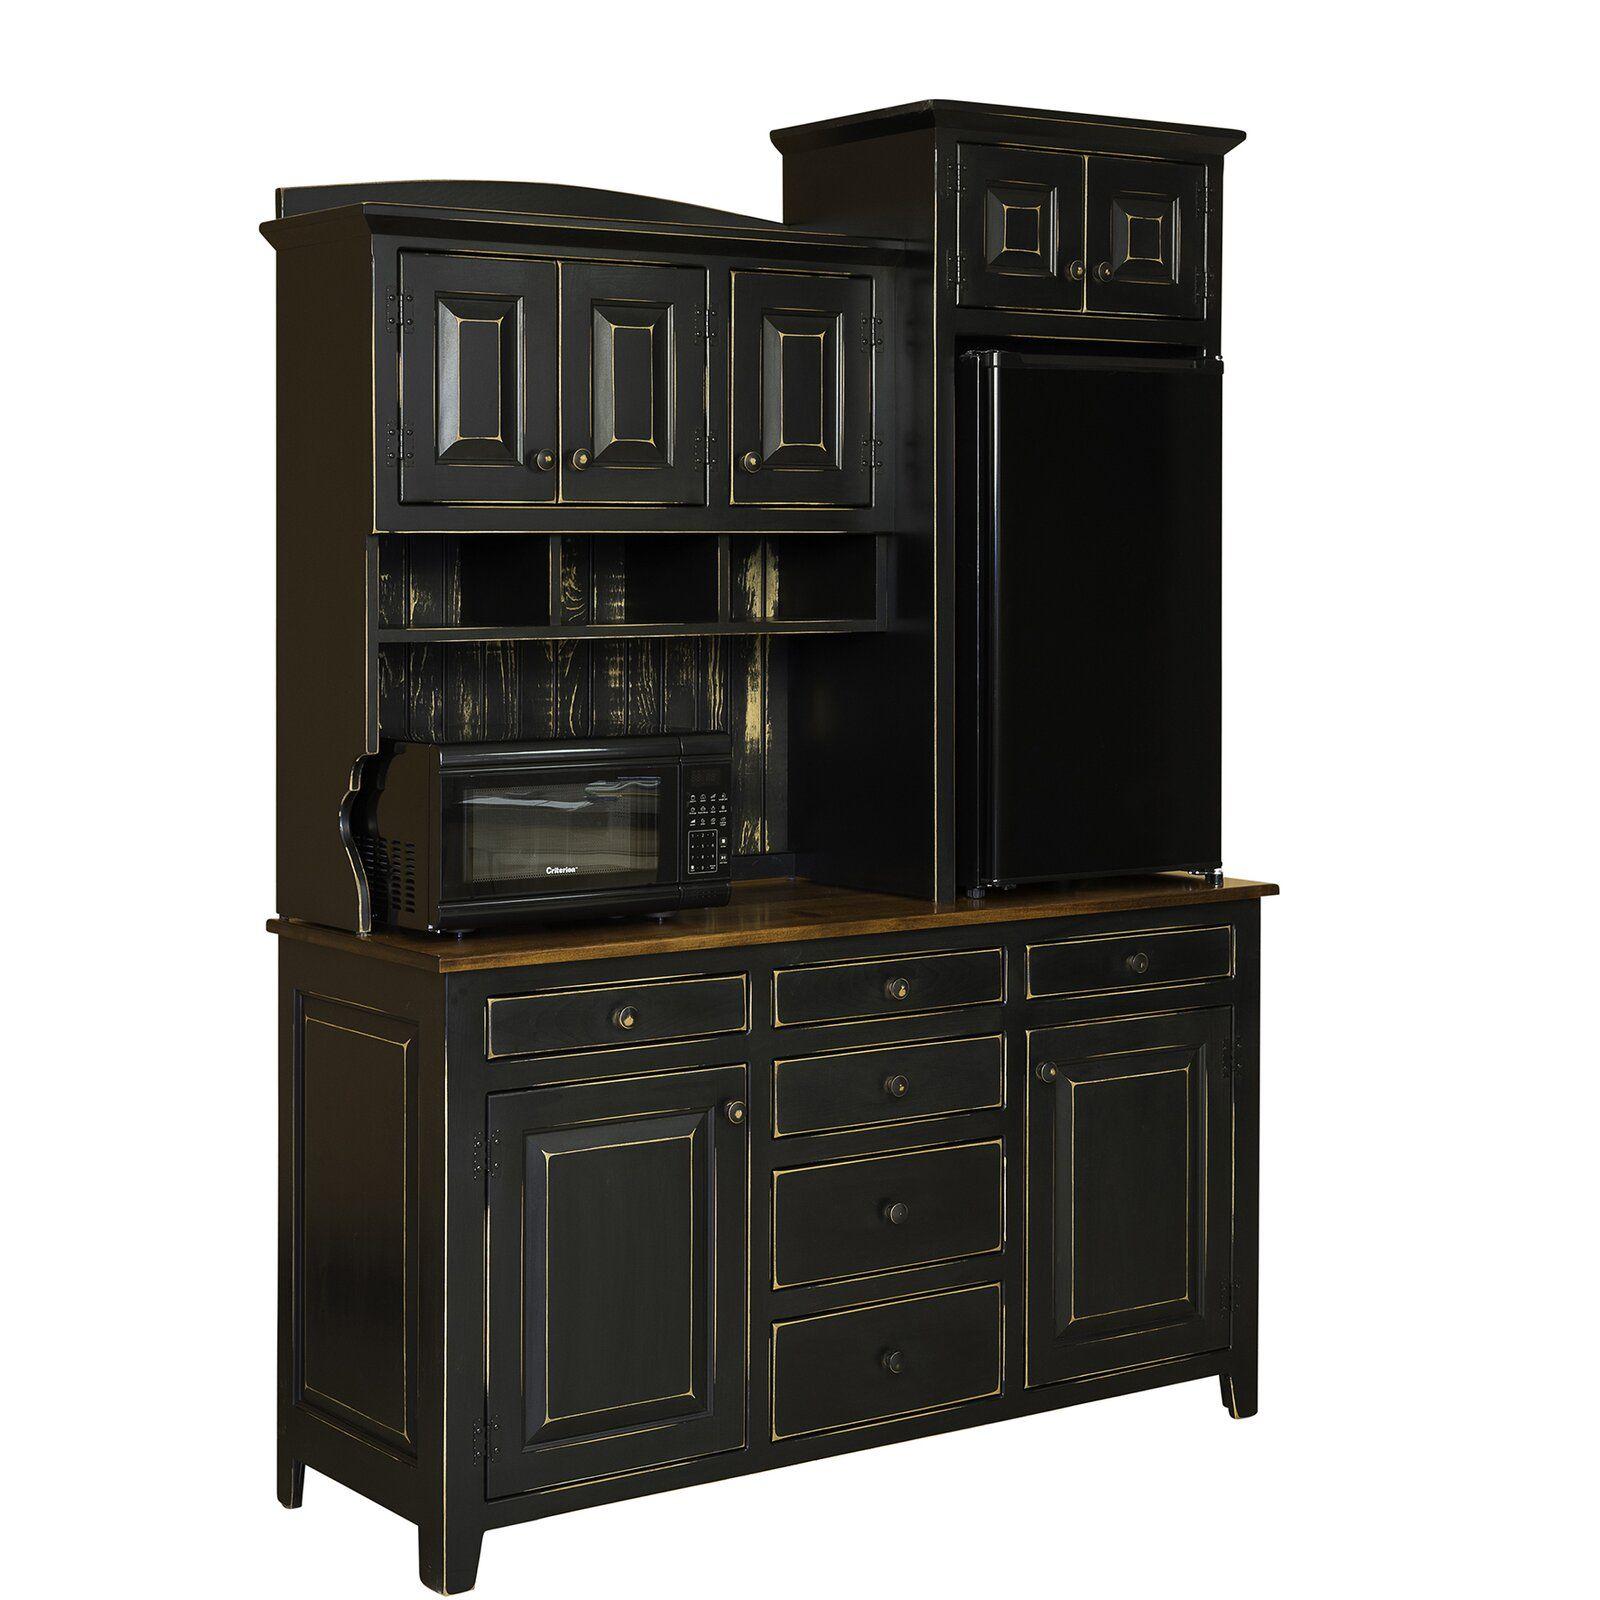 Best August Grove Glidewell 82 Kitchen Pantry Kitchen Pantry 400 x 300